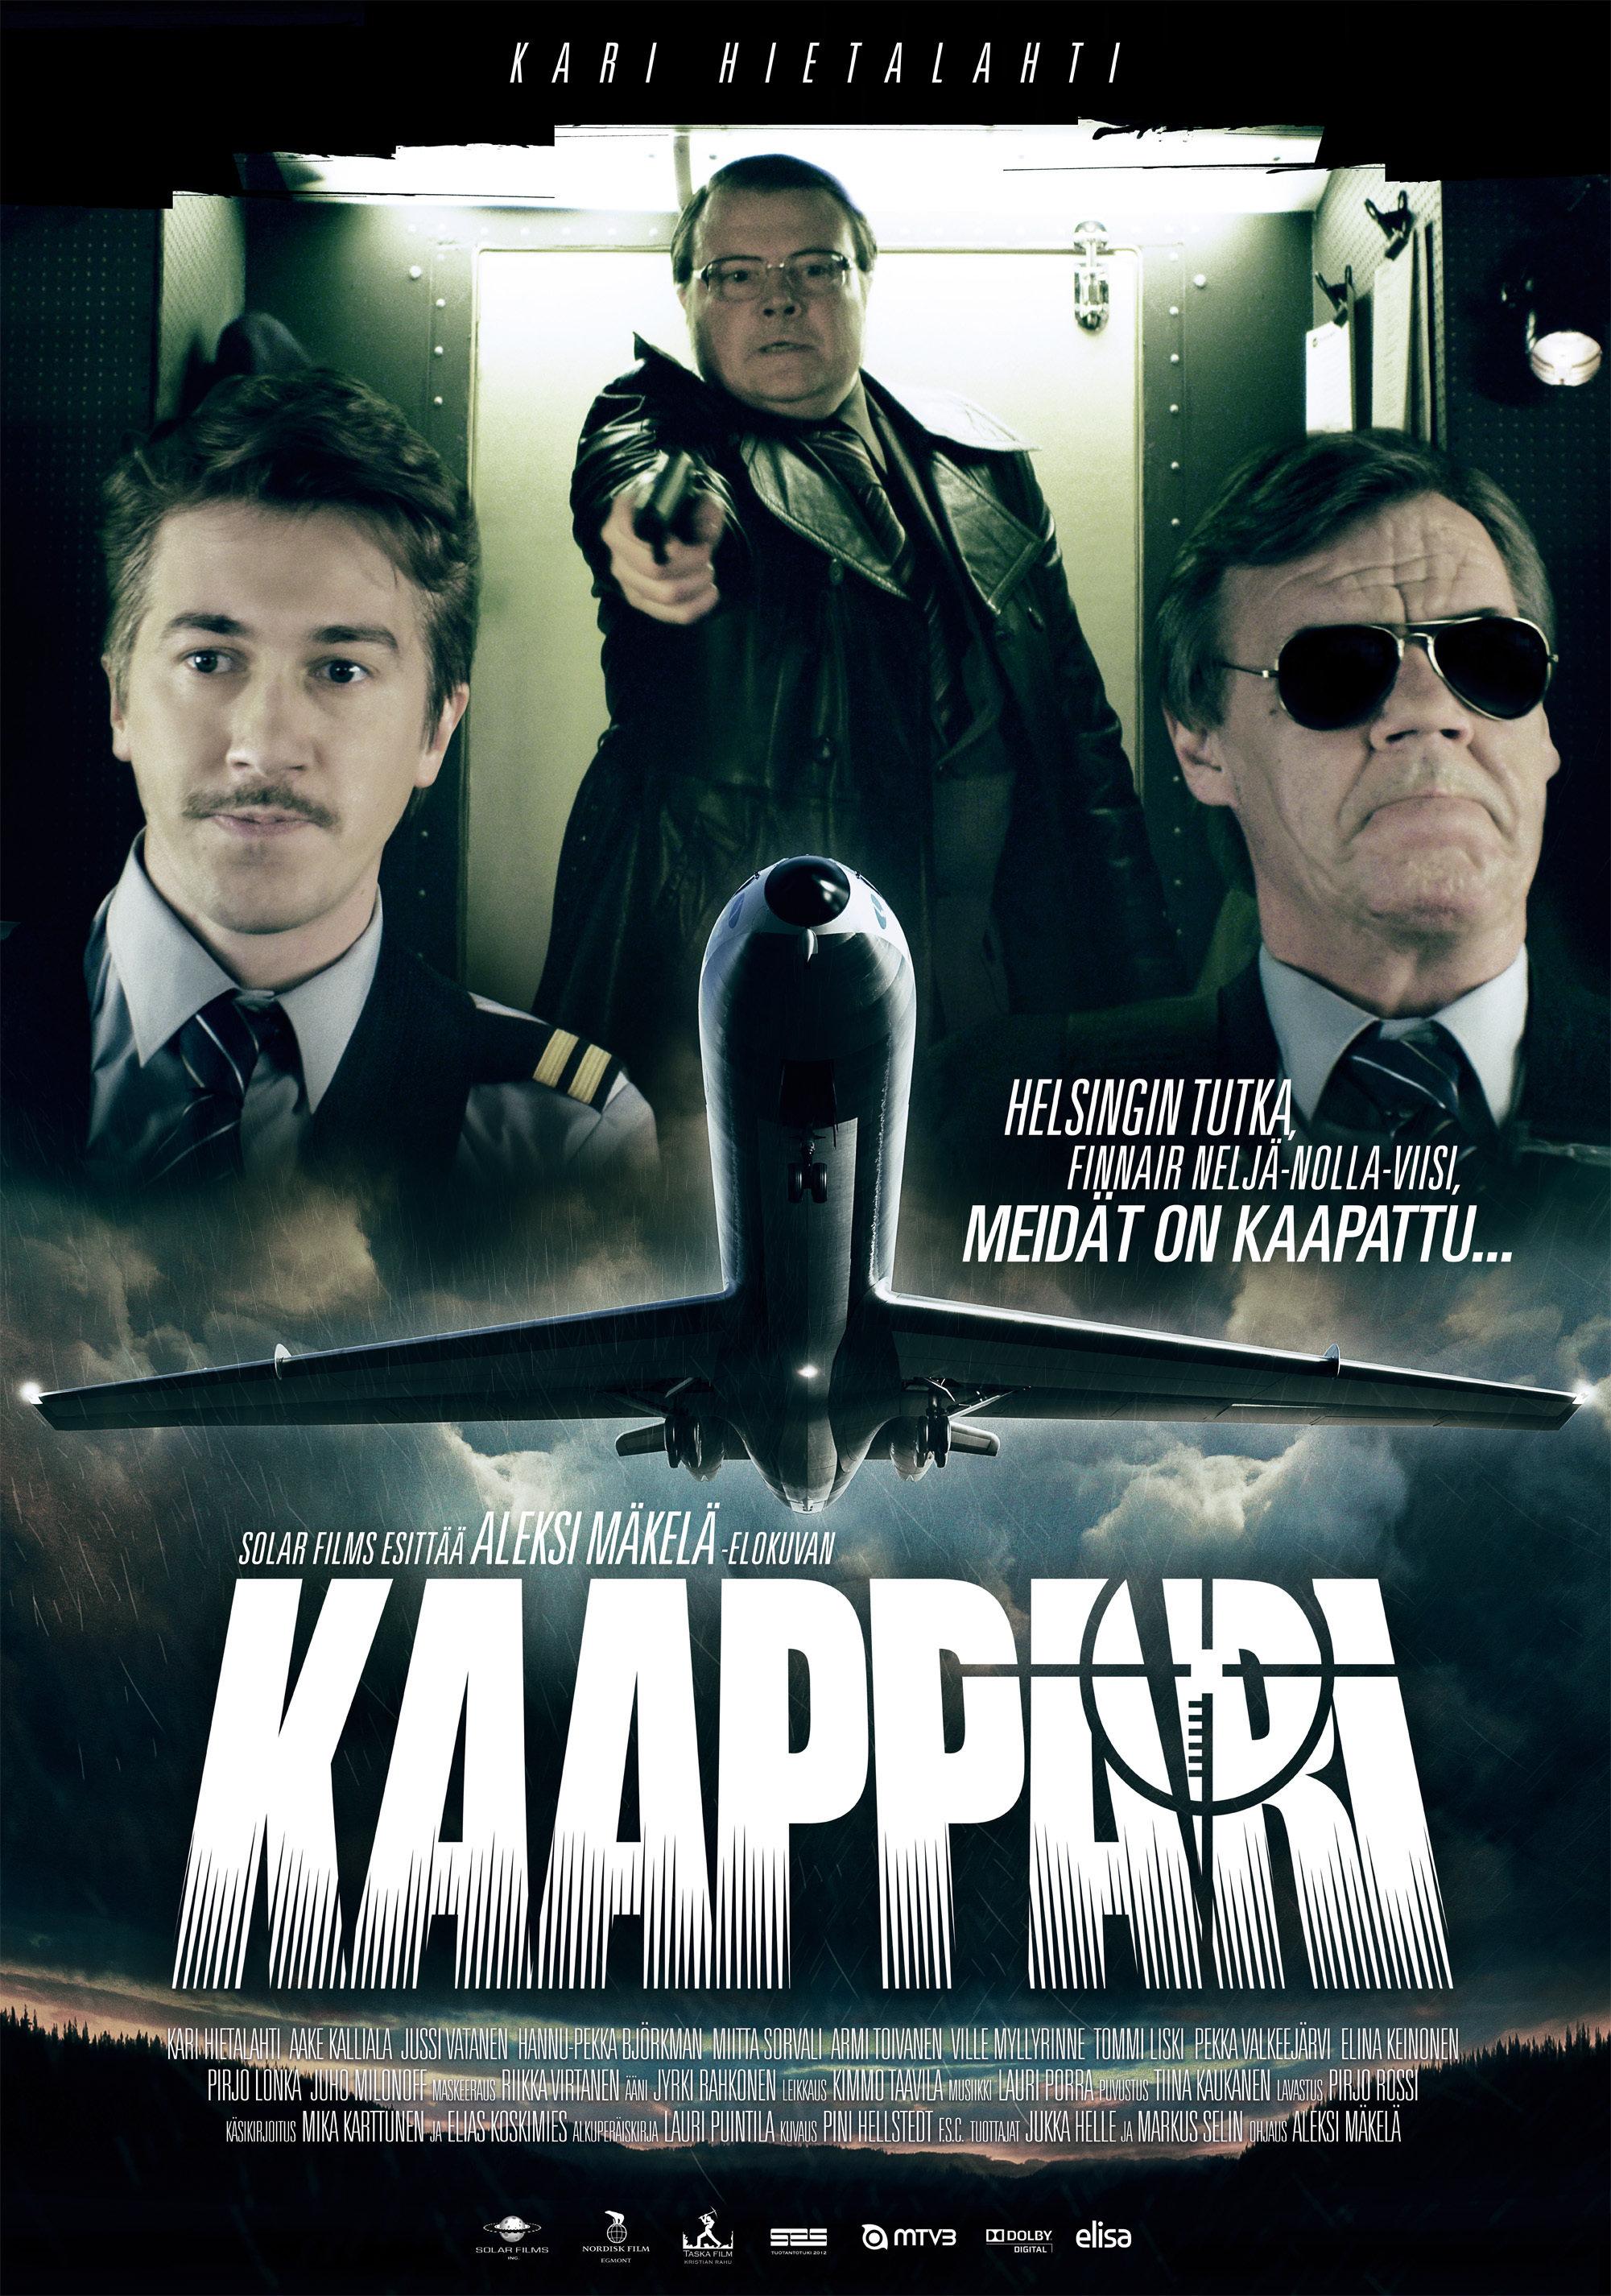 image Kaappari Watch Full Movie Free Online